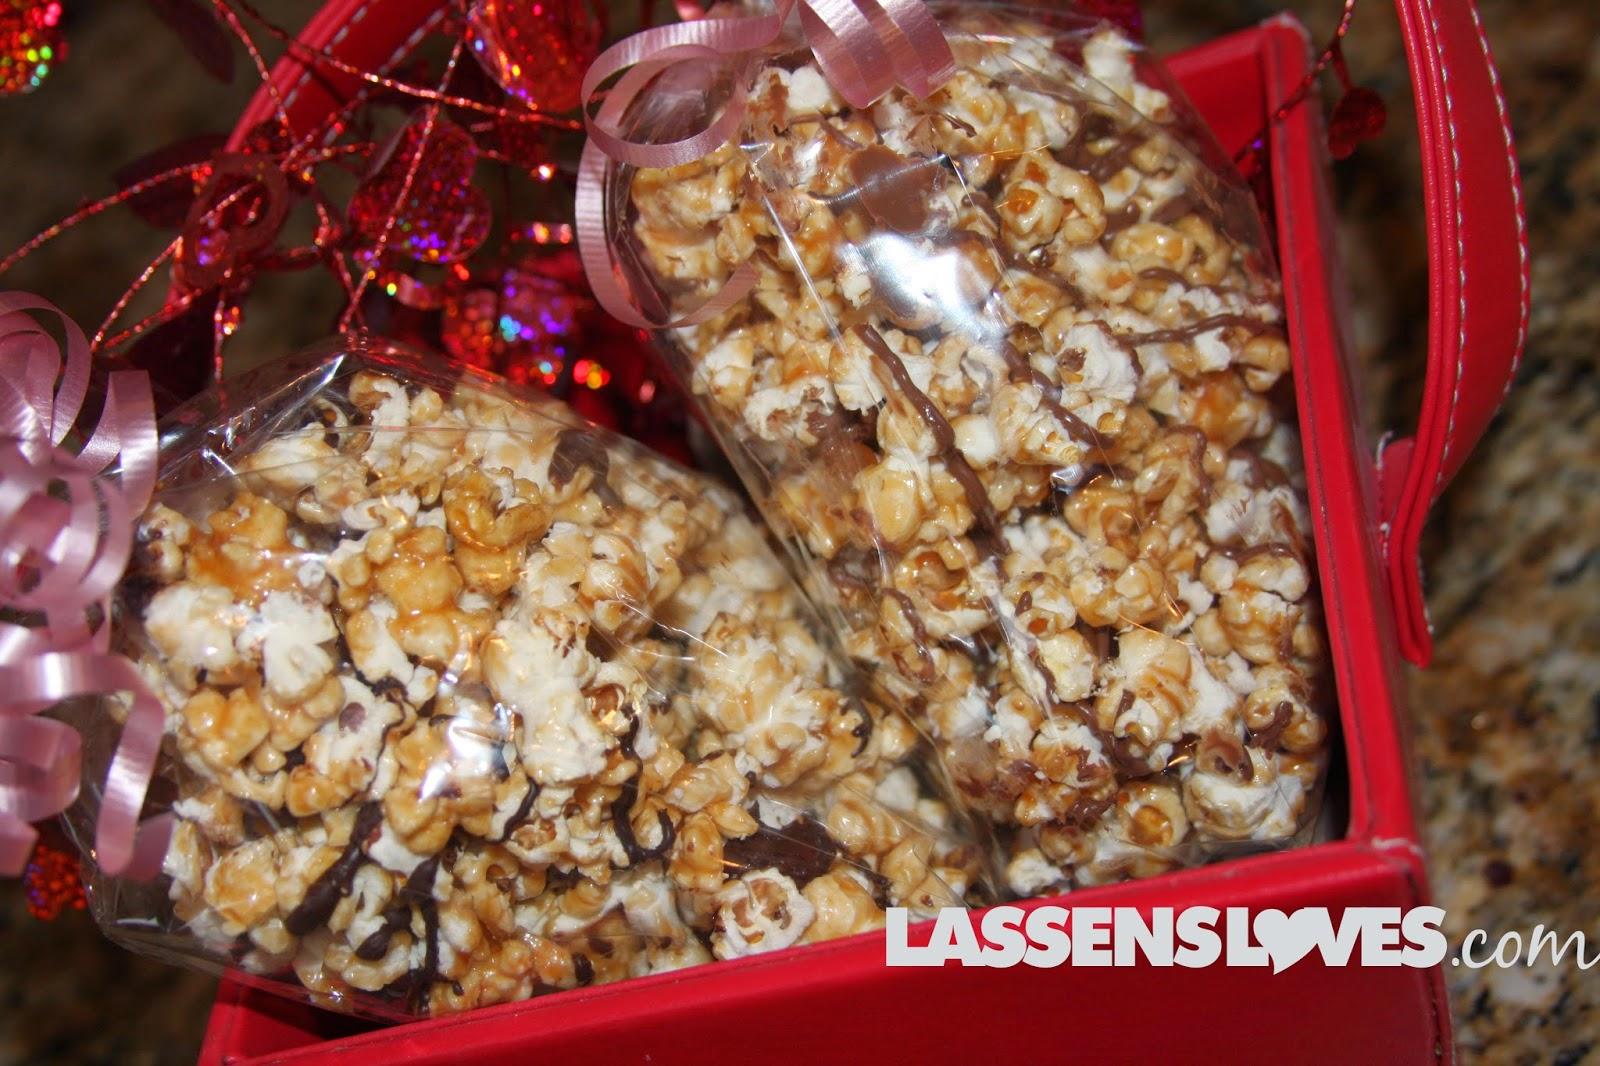 agave+caramel, agave+caramel+popcorn, valentines+day